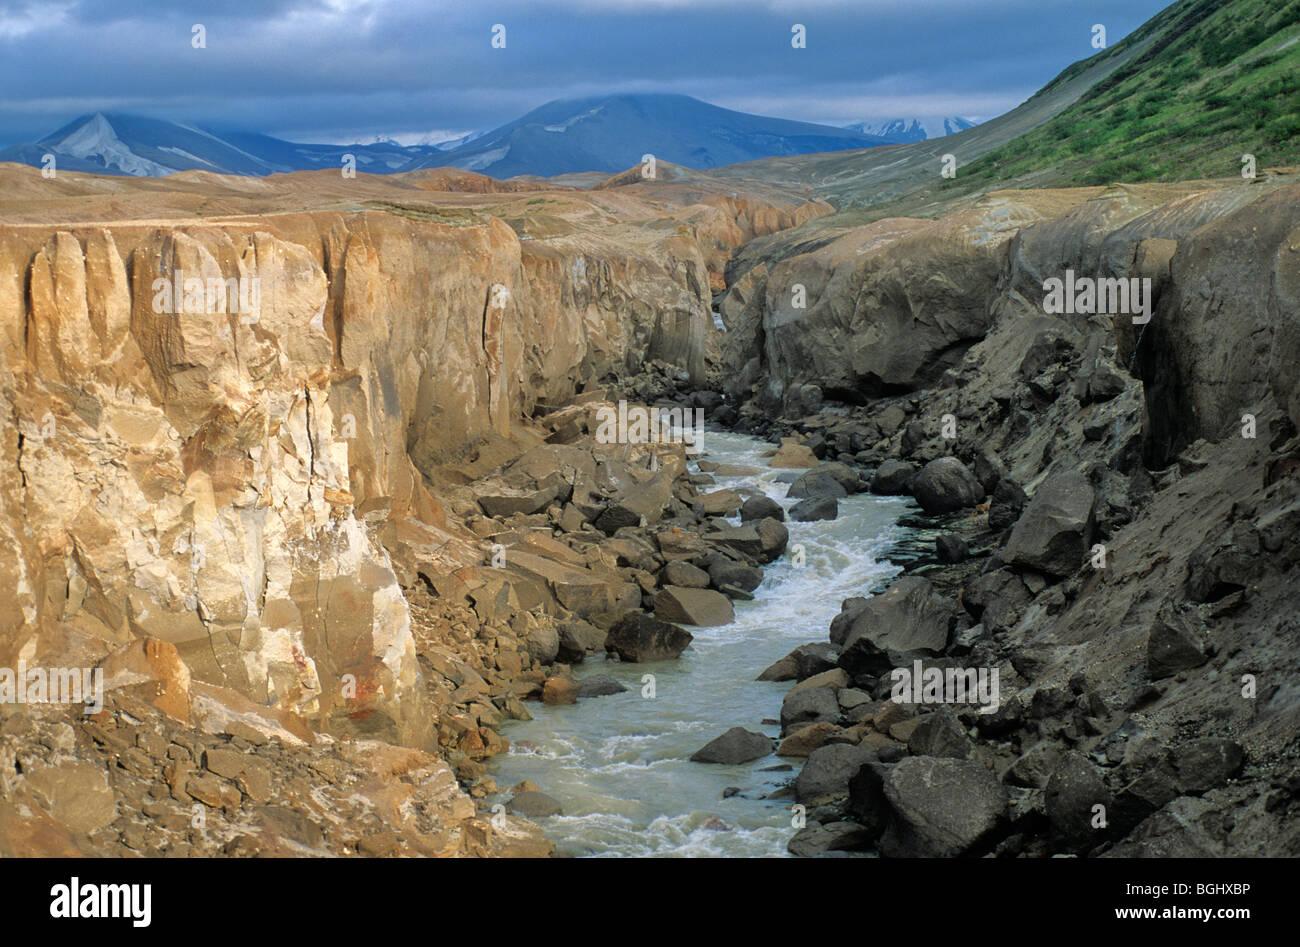 River Lethe carves canyon through ash deposits in Valley of Ten Thousand Smokes, Katmai National Park, Alaska, USA - Stock Image